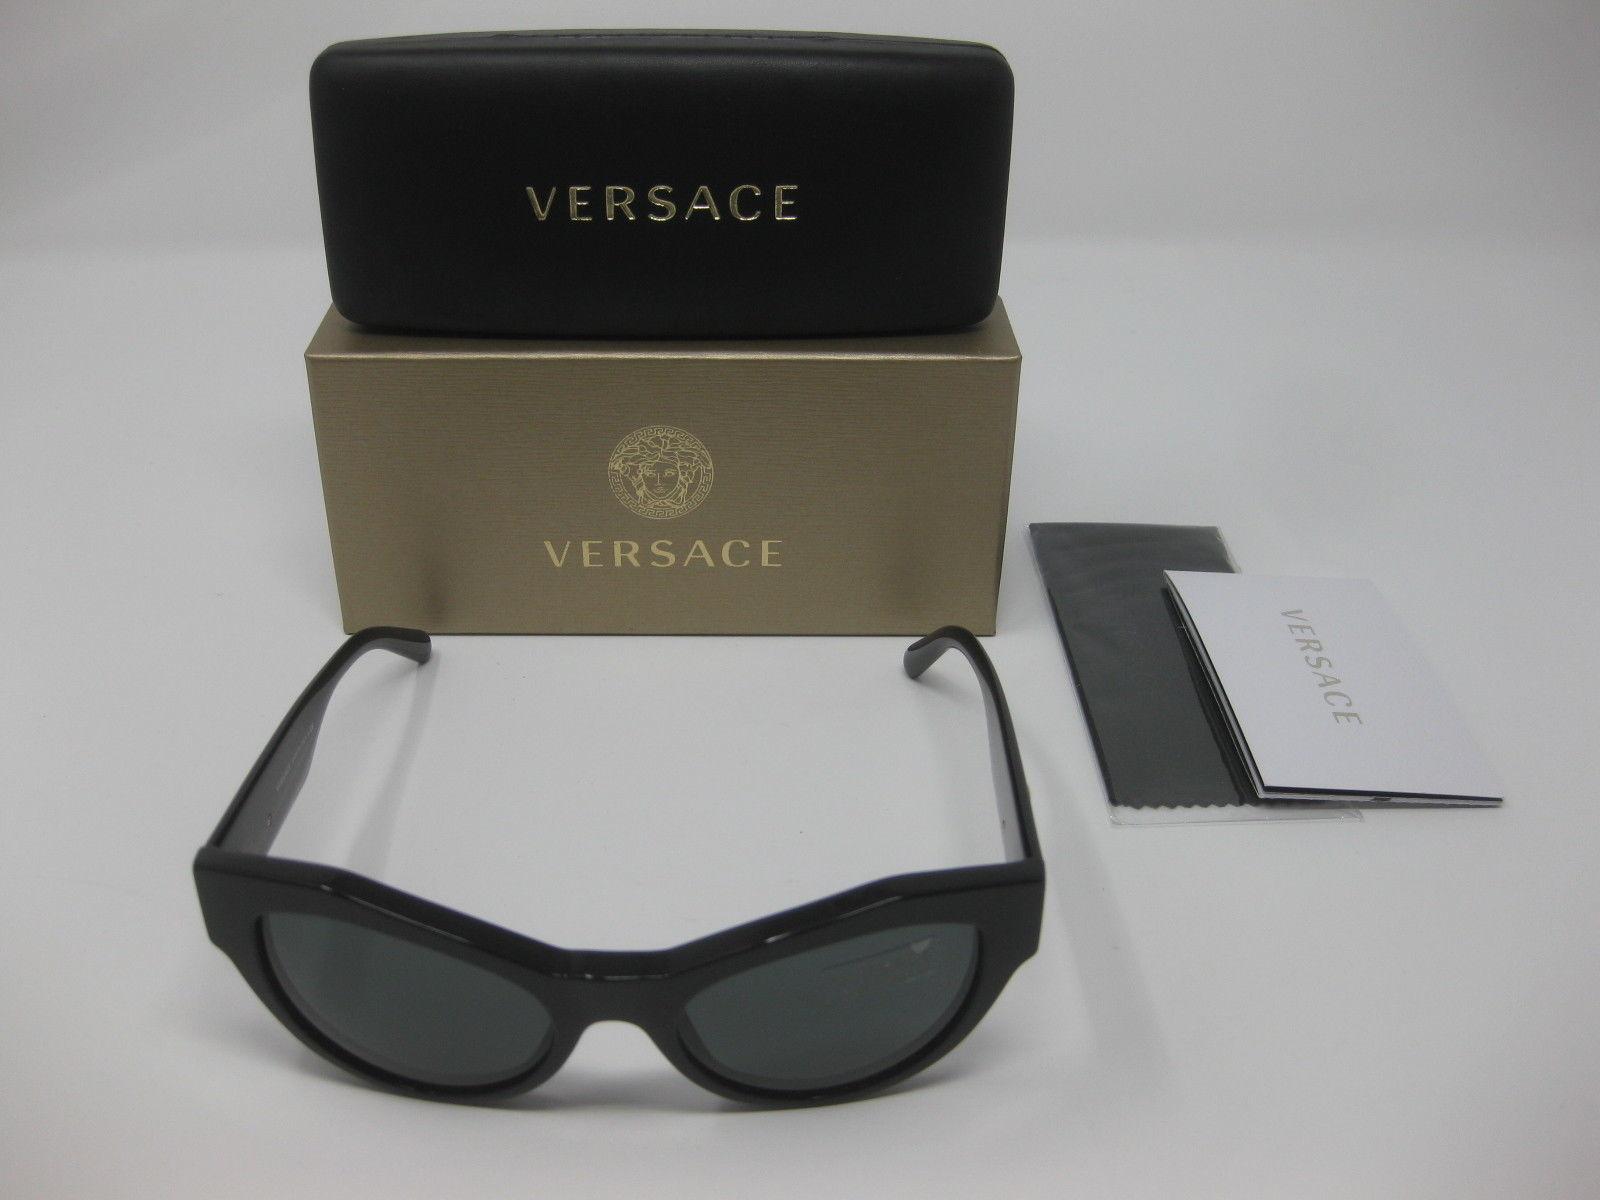 ae3038a576828 57. 57. Previous. Versace 4253 GB1 87 53 19 140 Cat Eye Women s Black Frame  Grey Lens Sunglasses